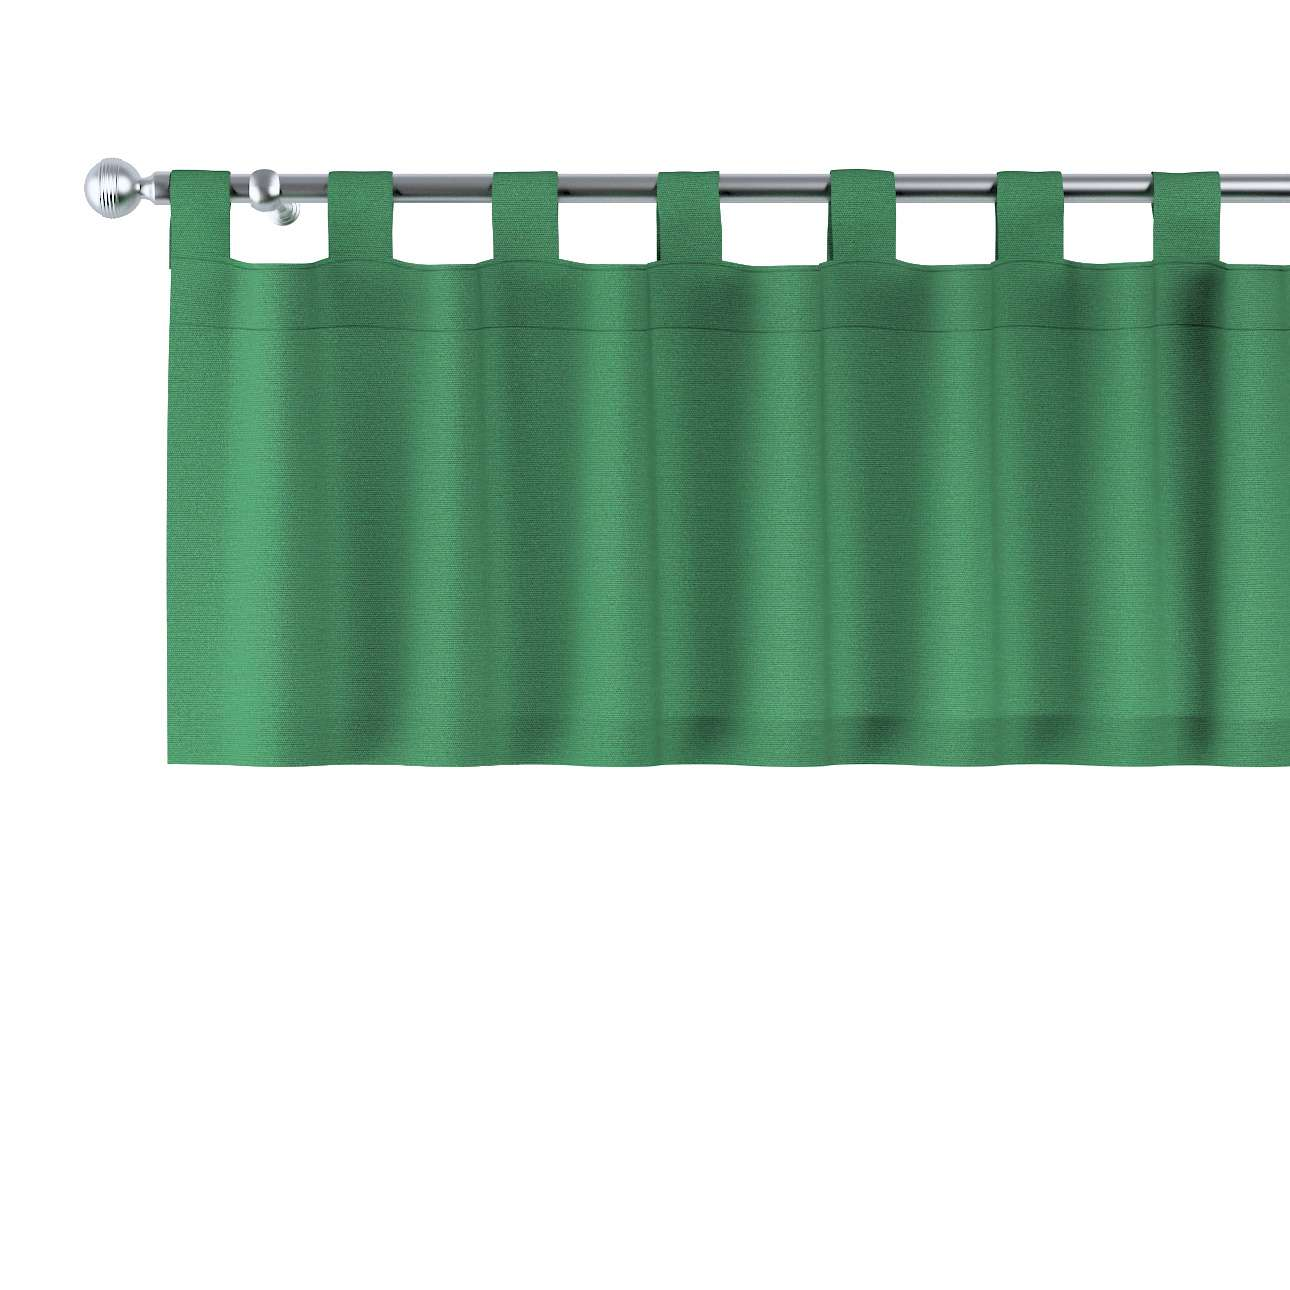 Lambrekin na szelkach 130x40cm w kolekcji Loneta, tkanina: 133-18